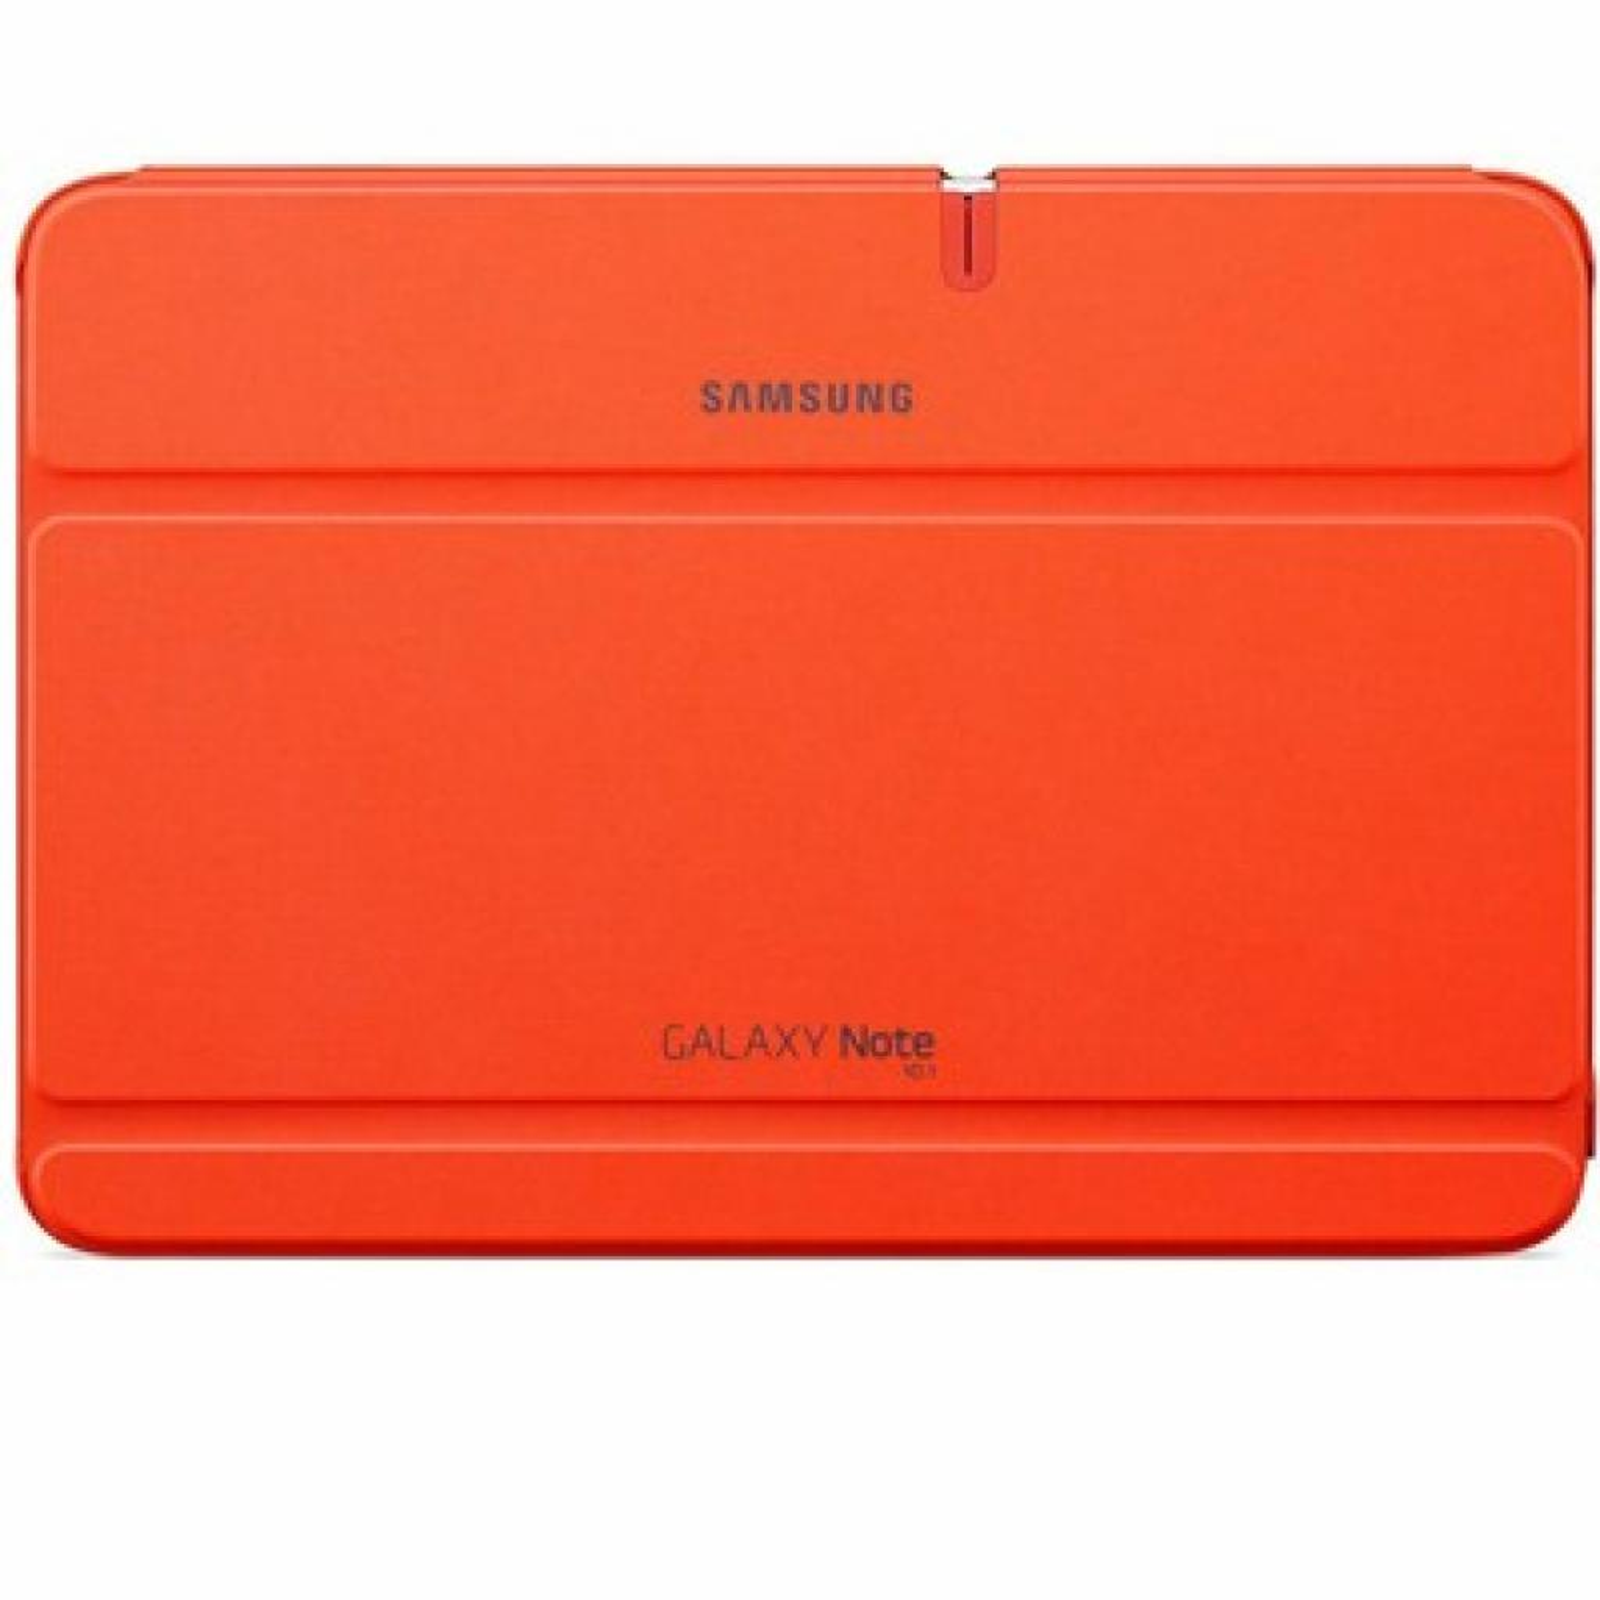 "Чехол для планшета Samsung N8000, 10.1"" Orange (EFC-1G2NOECSTD)"